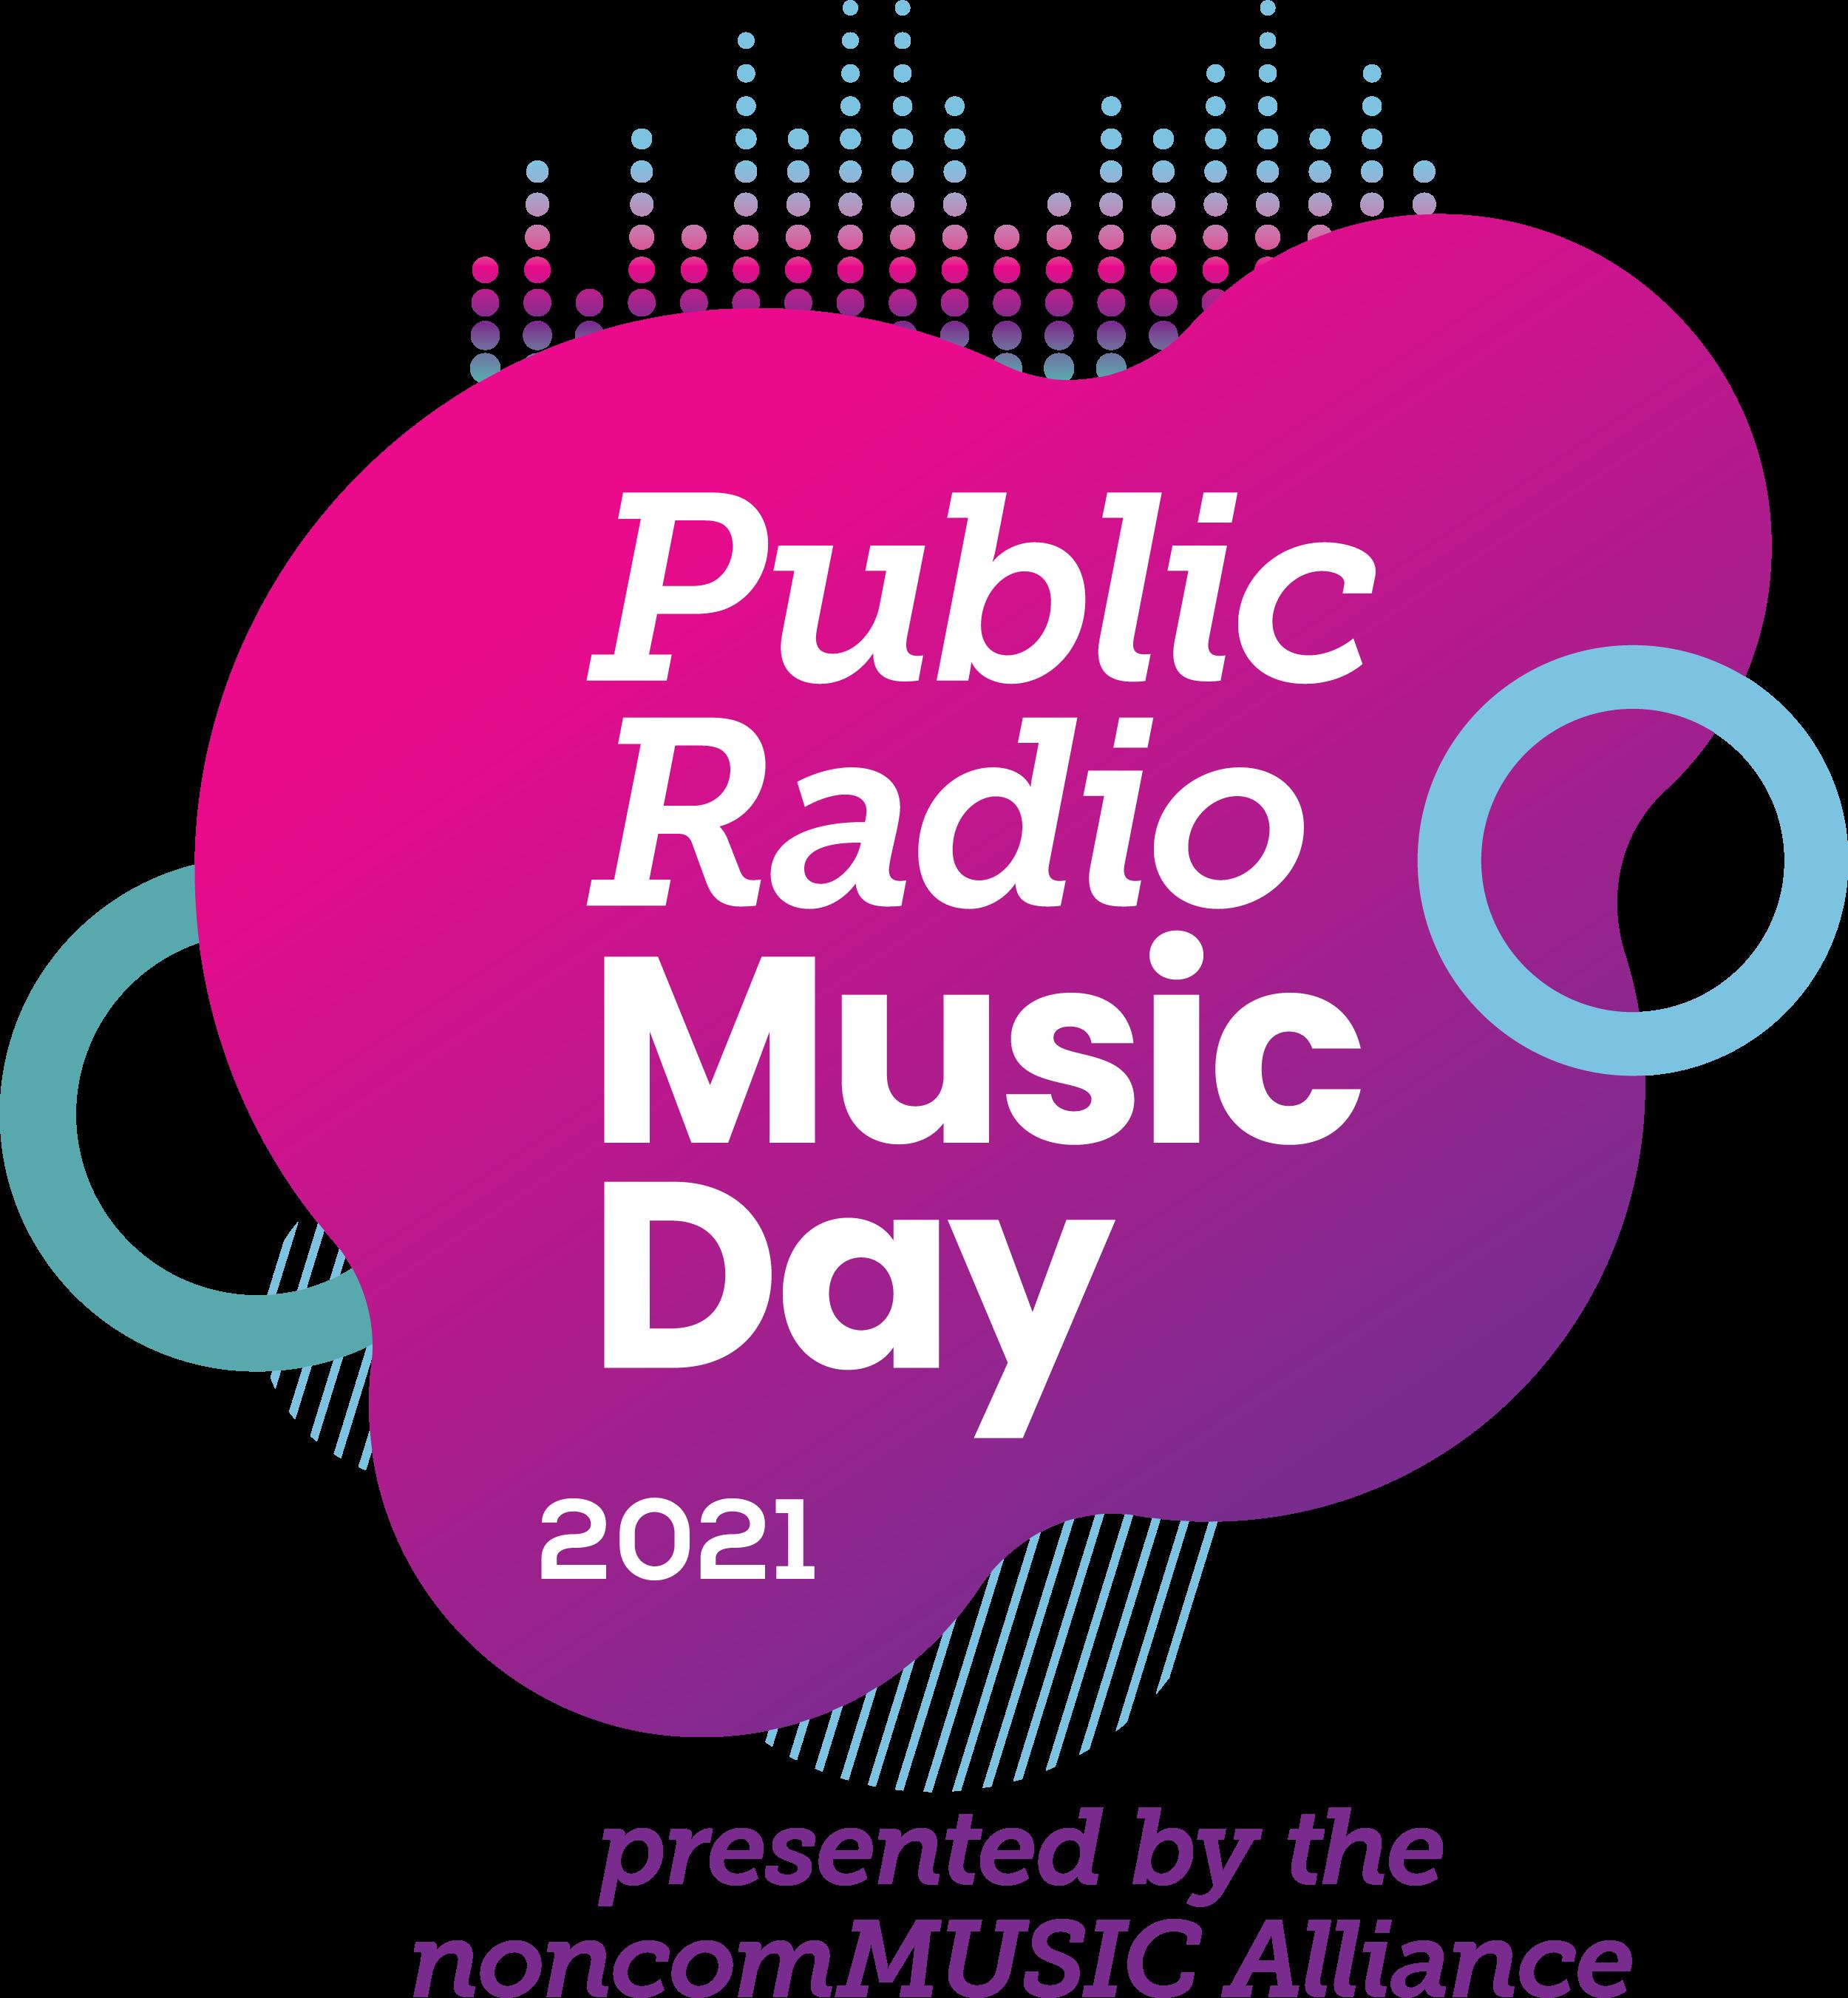 Public Radio Music Day